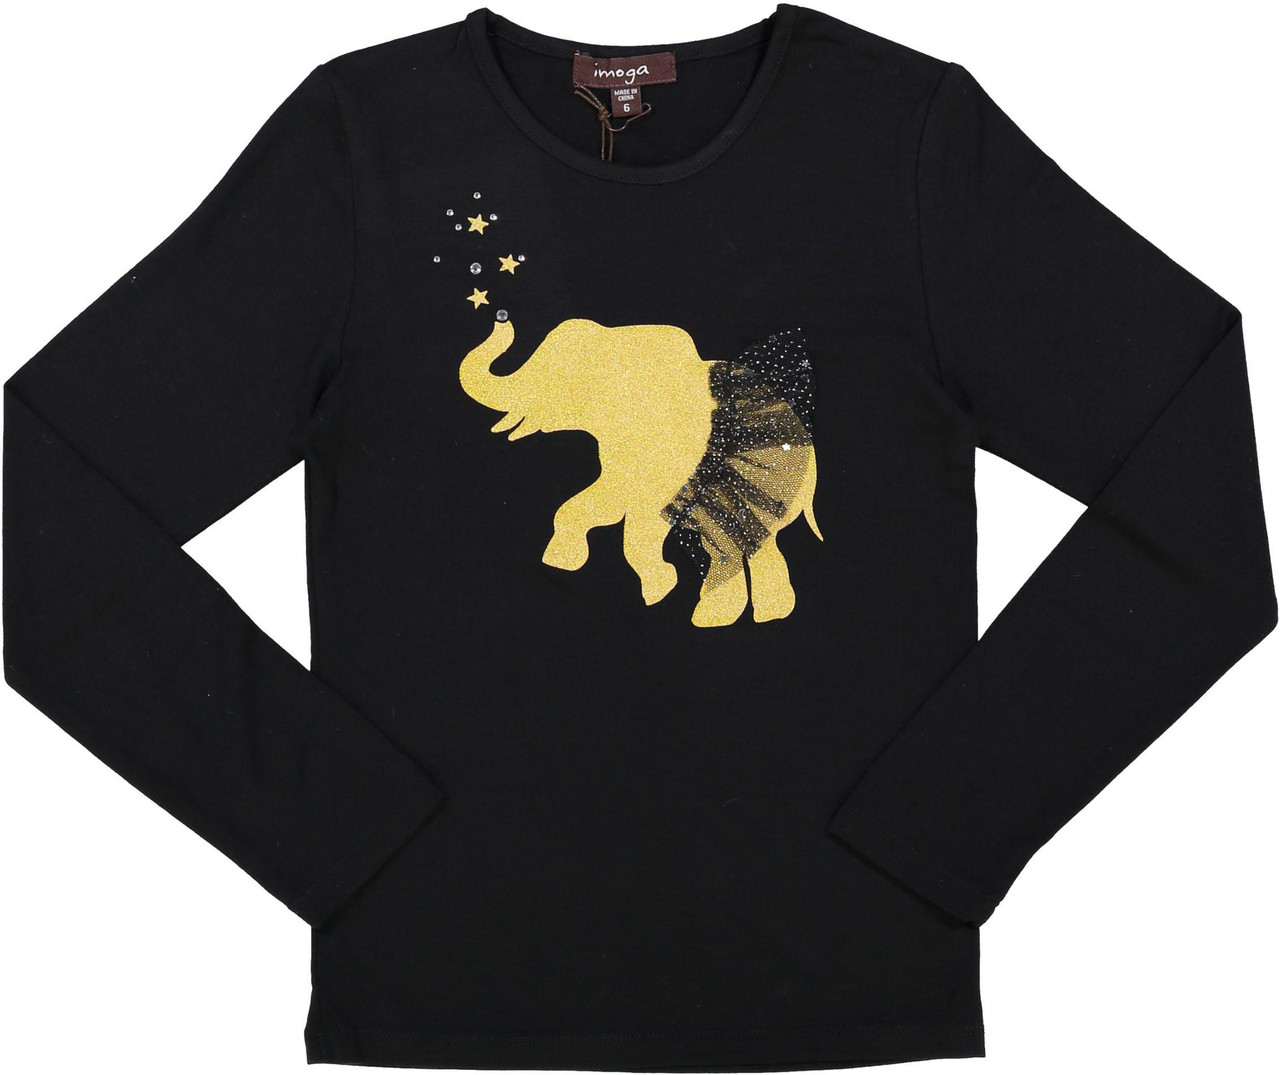 Imoga Girls Ariana Long Sleeve T-shirt